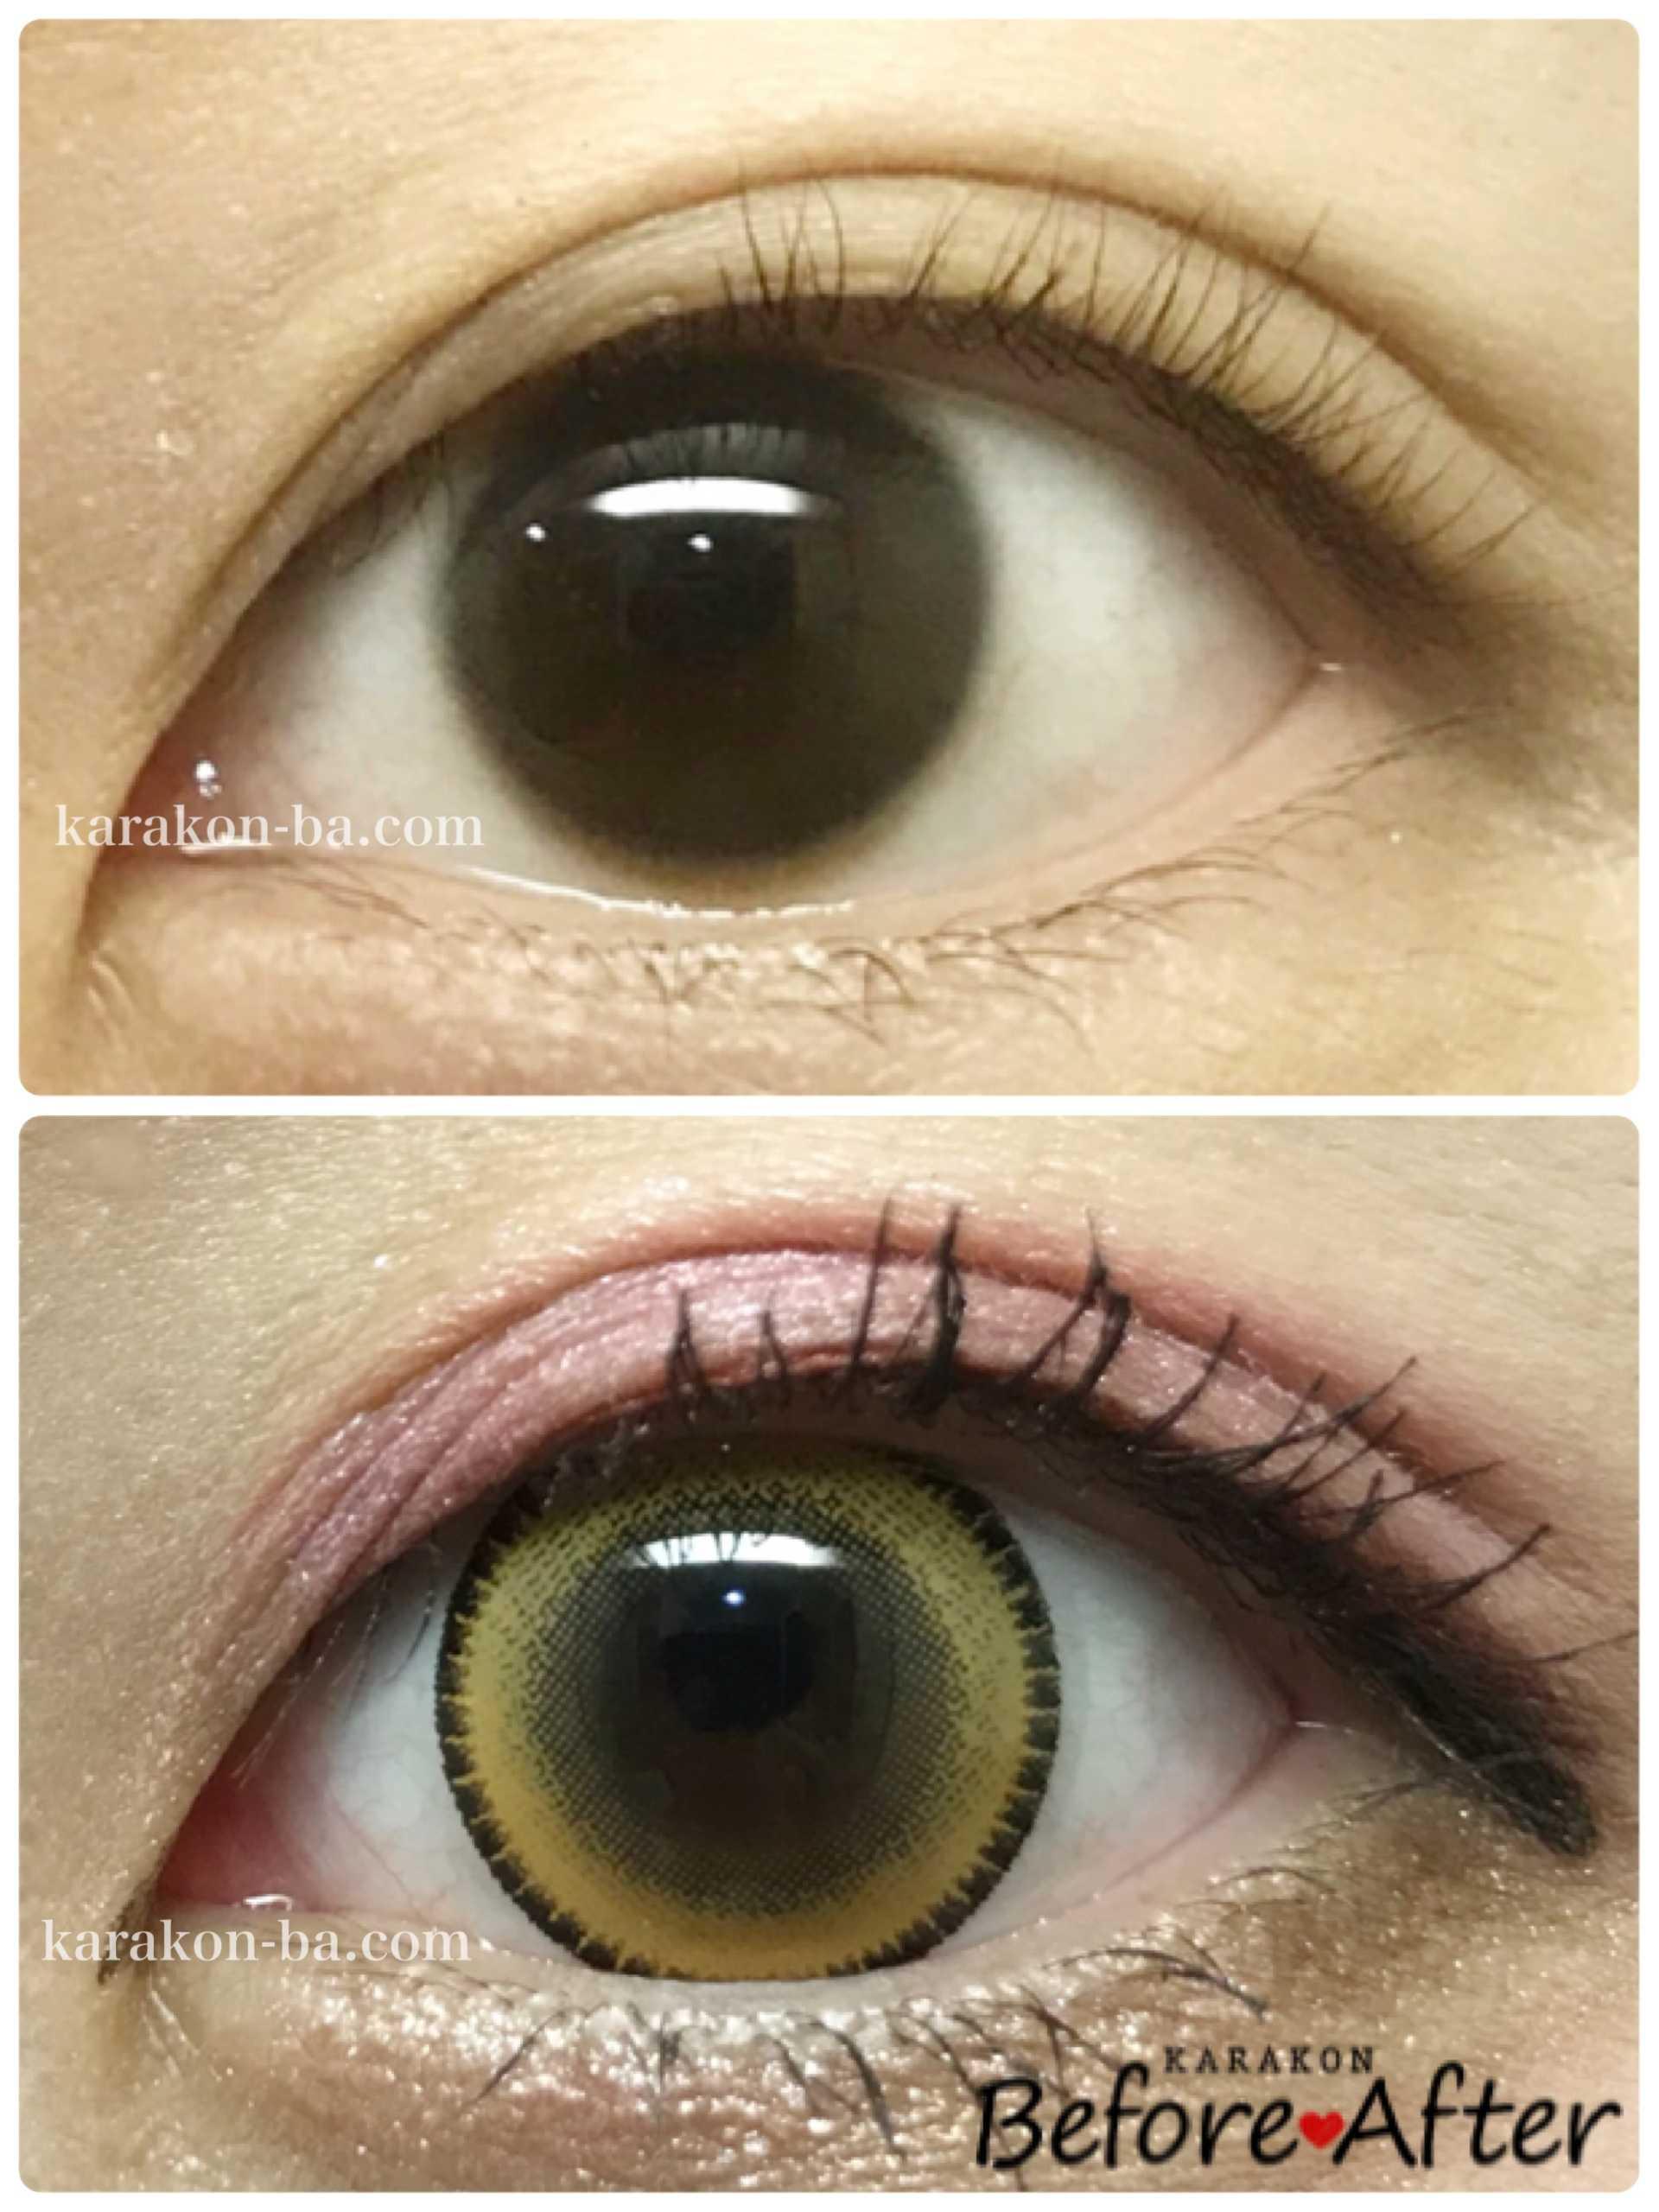 Assist ChouChou(アシスト シュシュ)パインキャンディーのカラコン装着画像/裸眼と比較レポ